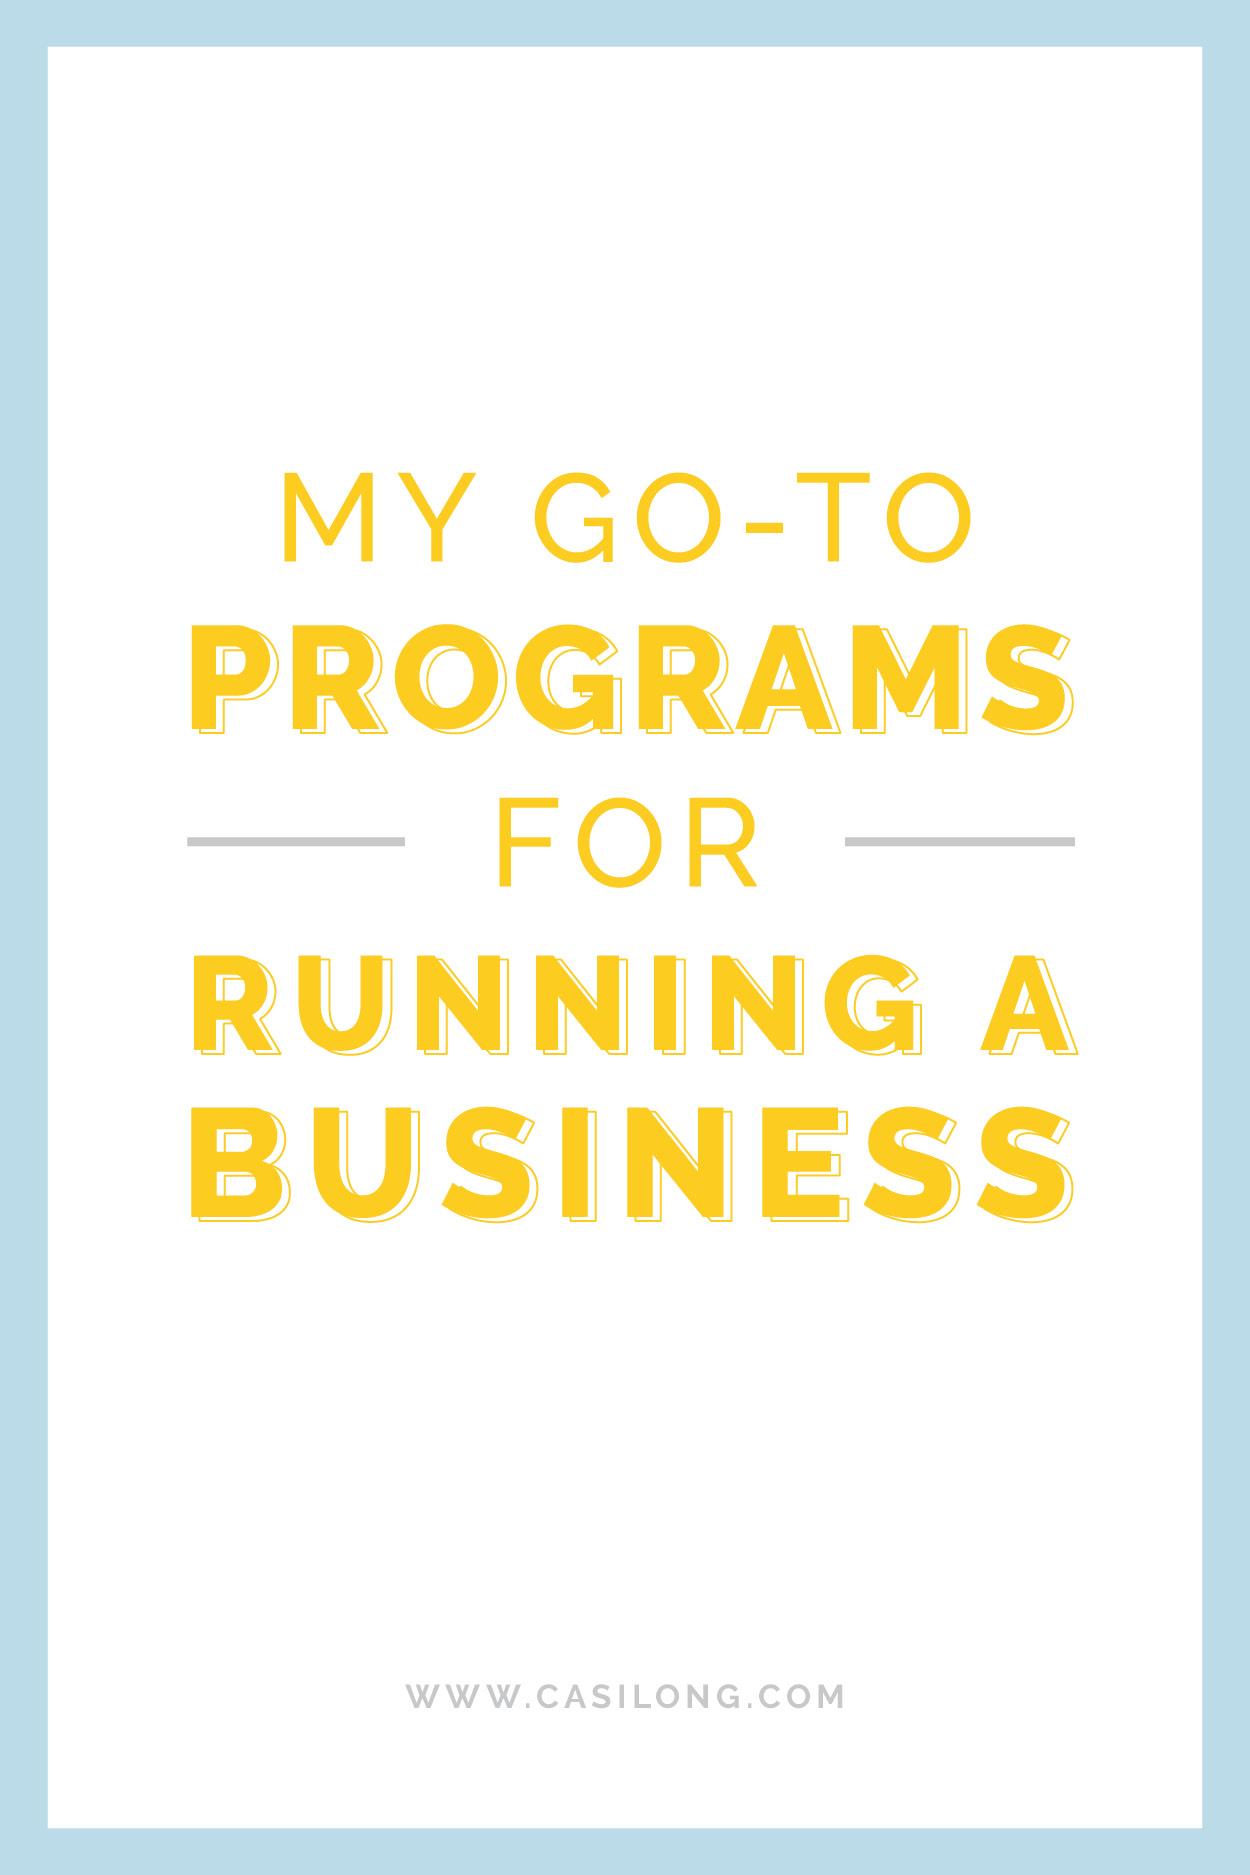 My Go-To Programs for Running a Business | On the Blog | casilong.com/blog #casilongdesign